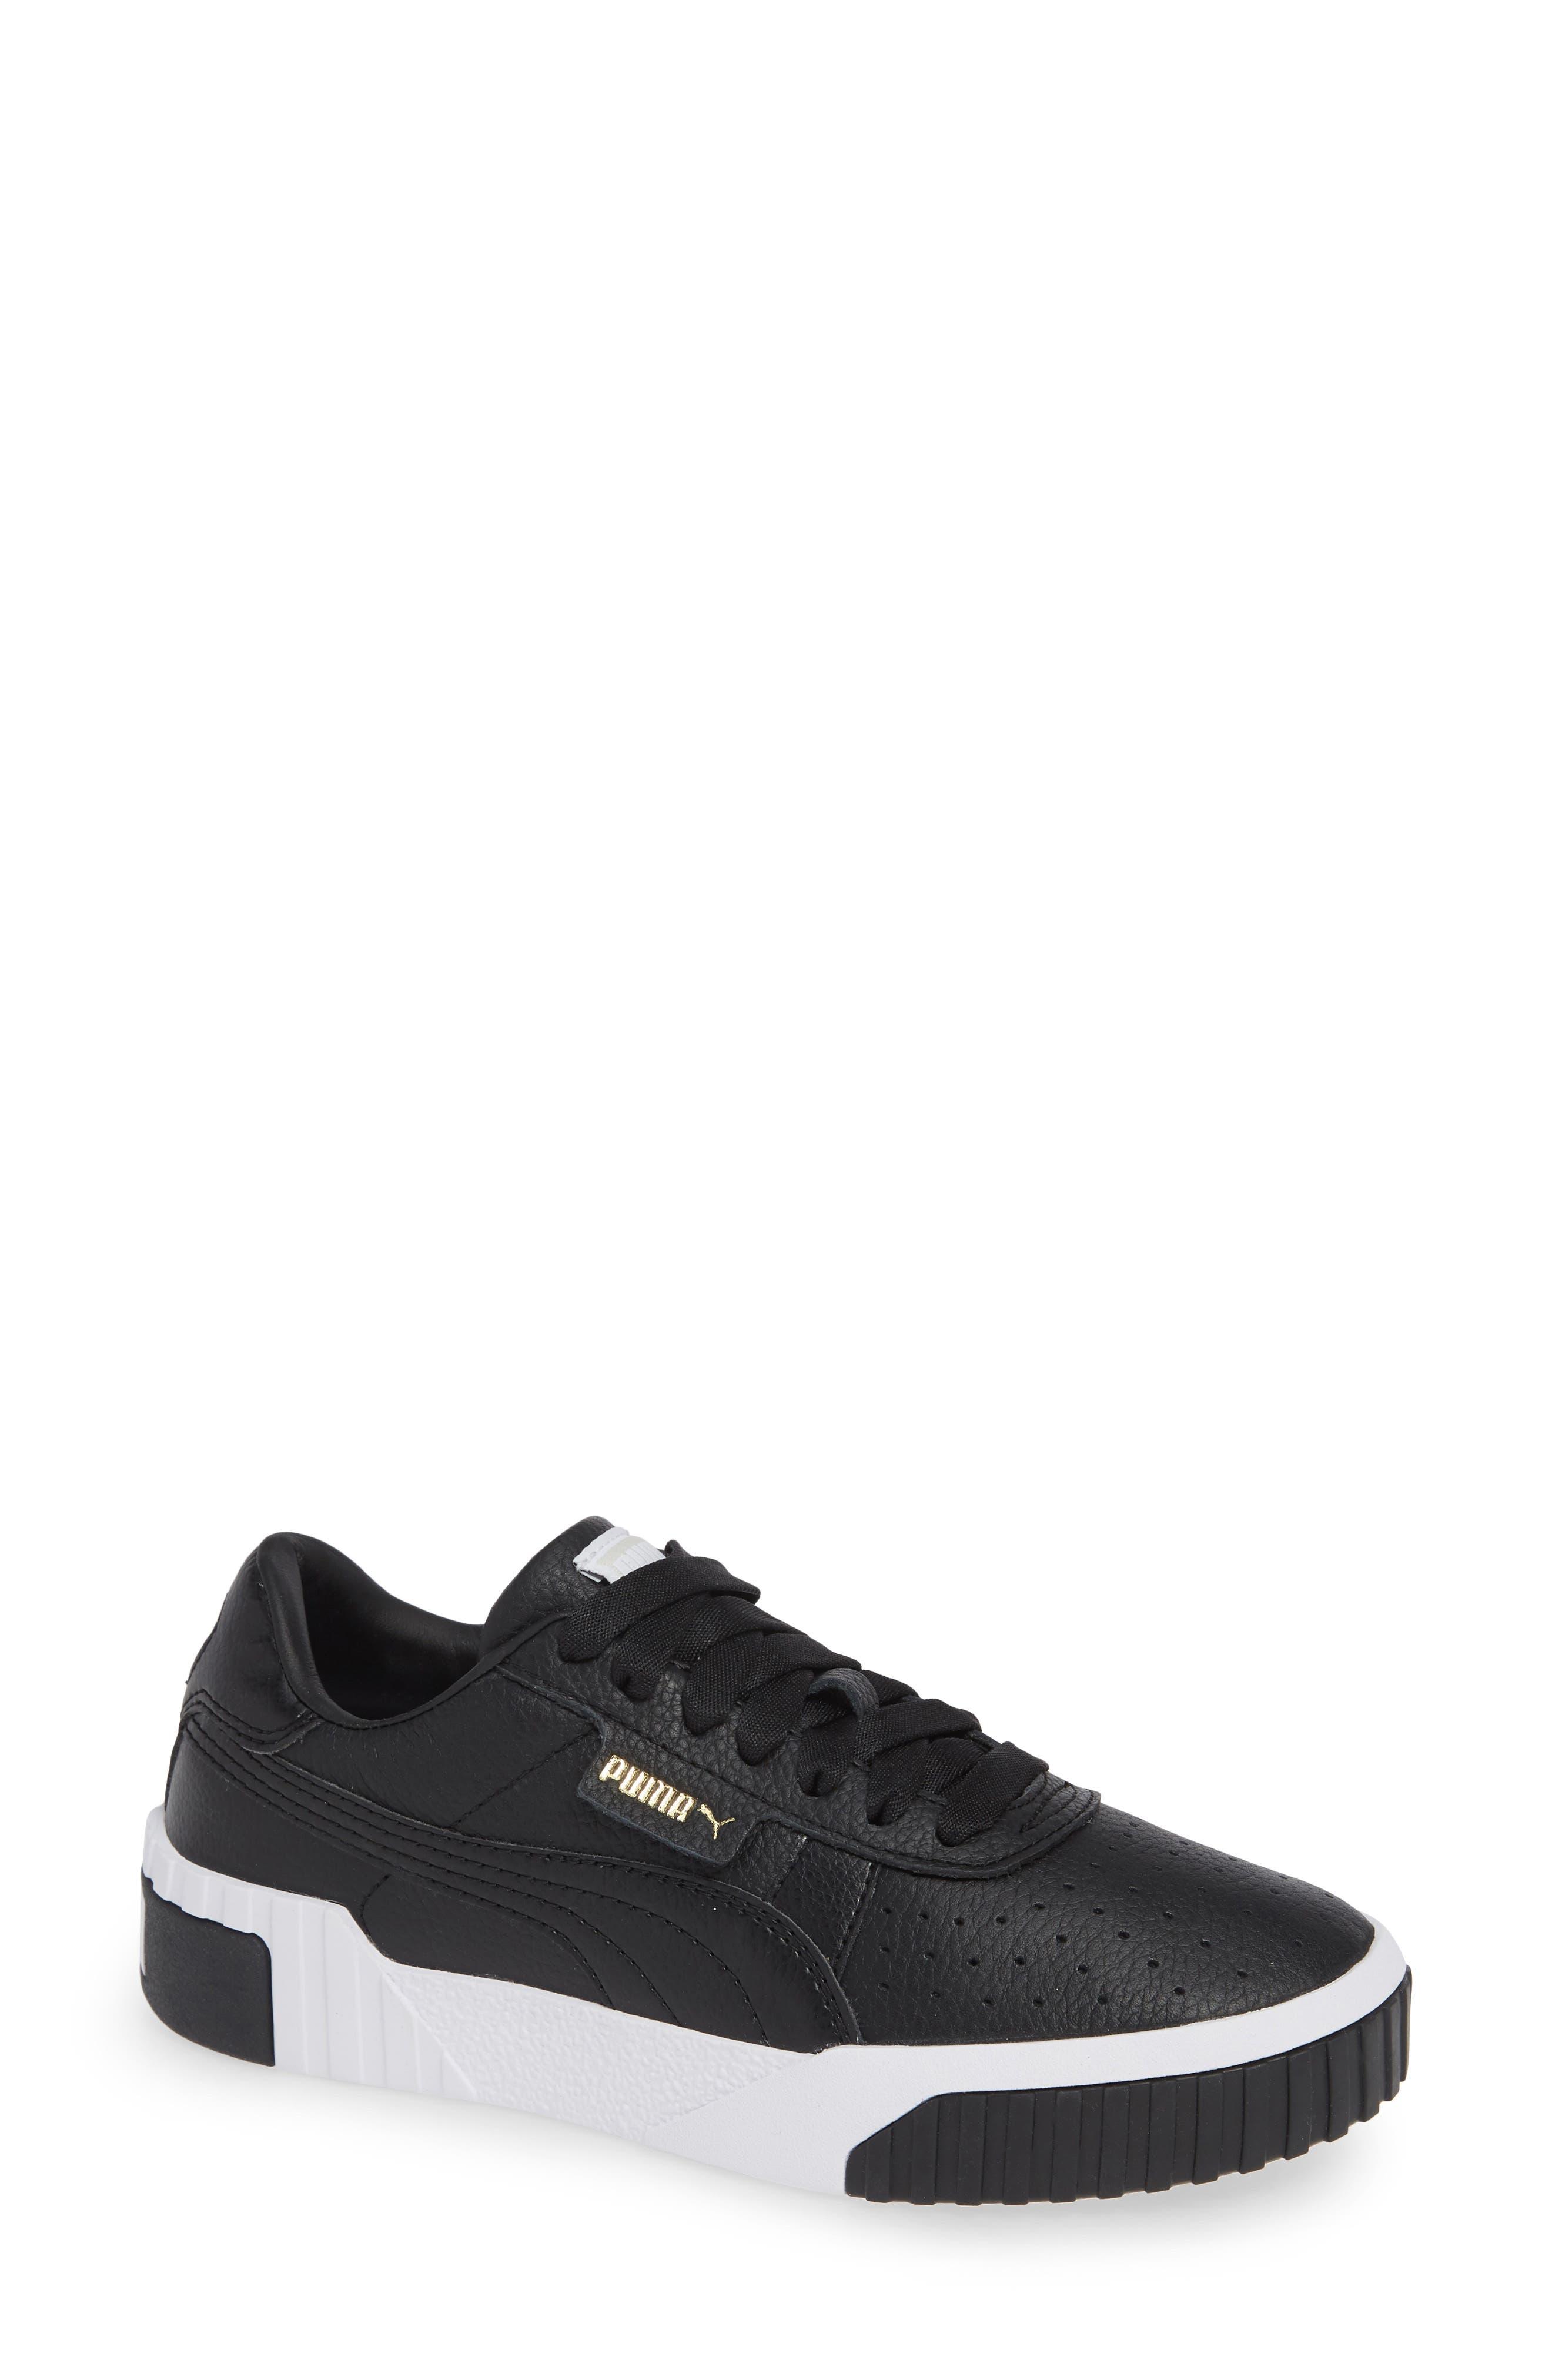 Women'S Cali Low Top Leather Sneakers in Puma Black/ Puma White